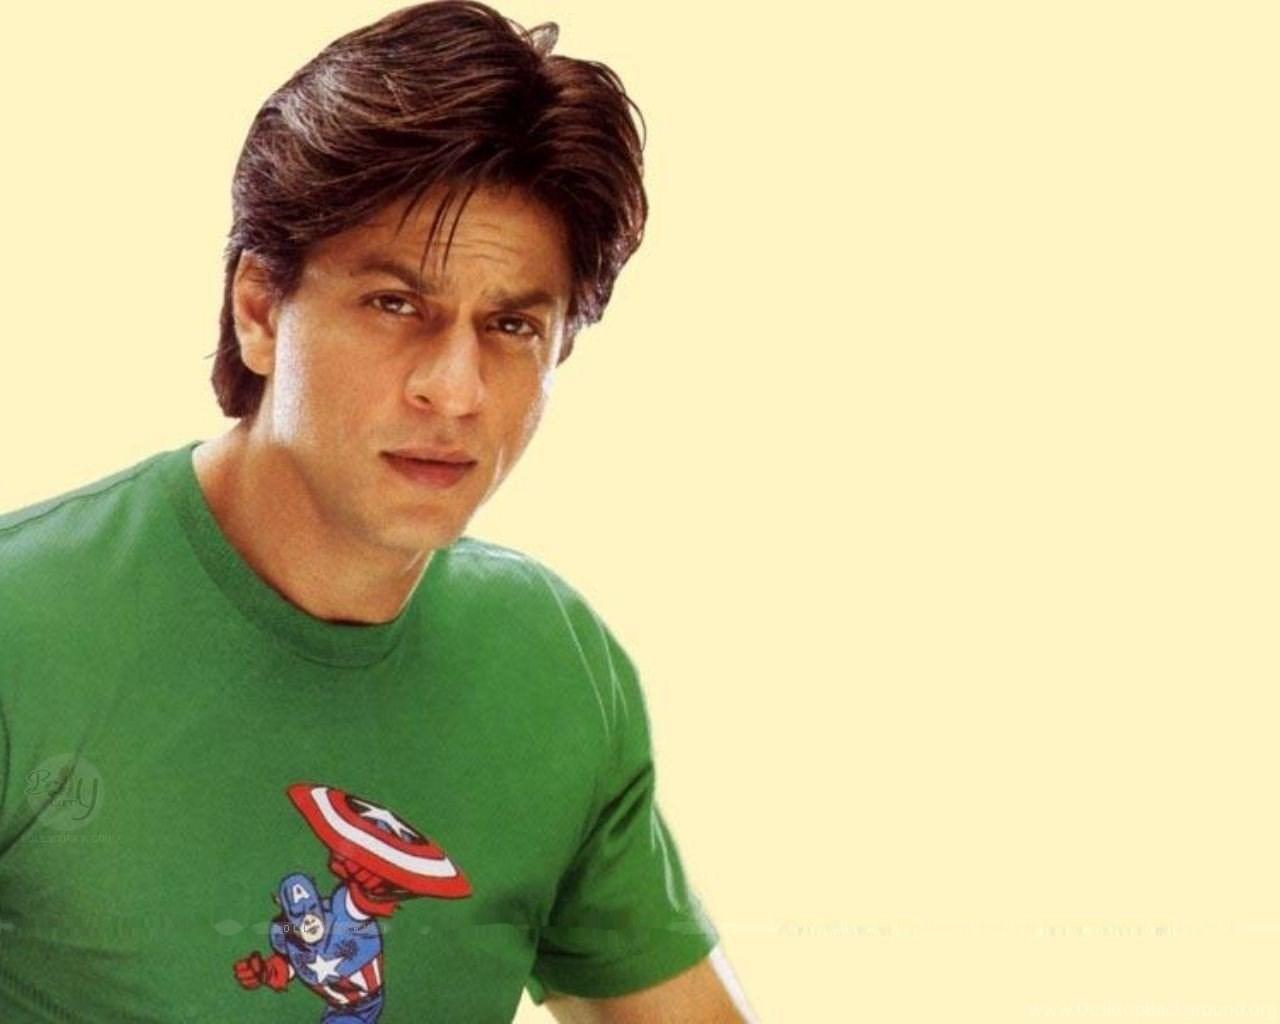 Wallpapers Shah Rukh Khan Free Download Wallpapers